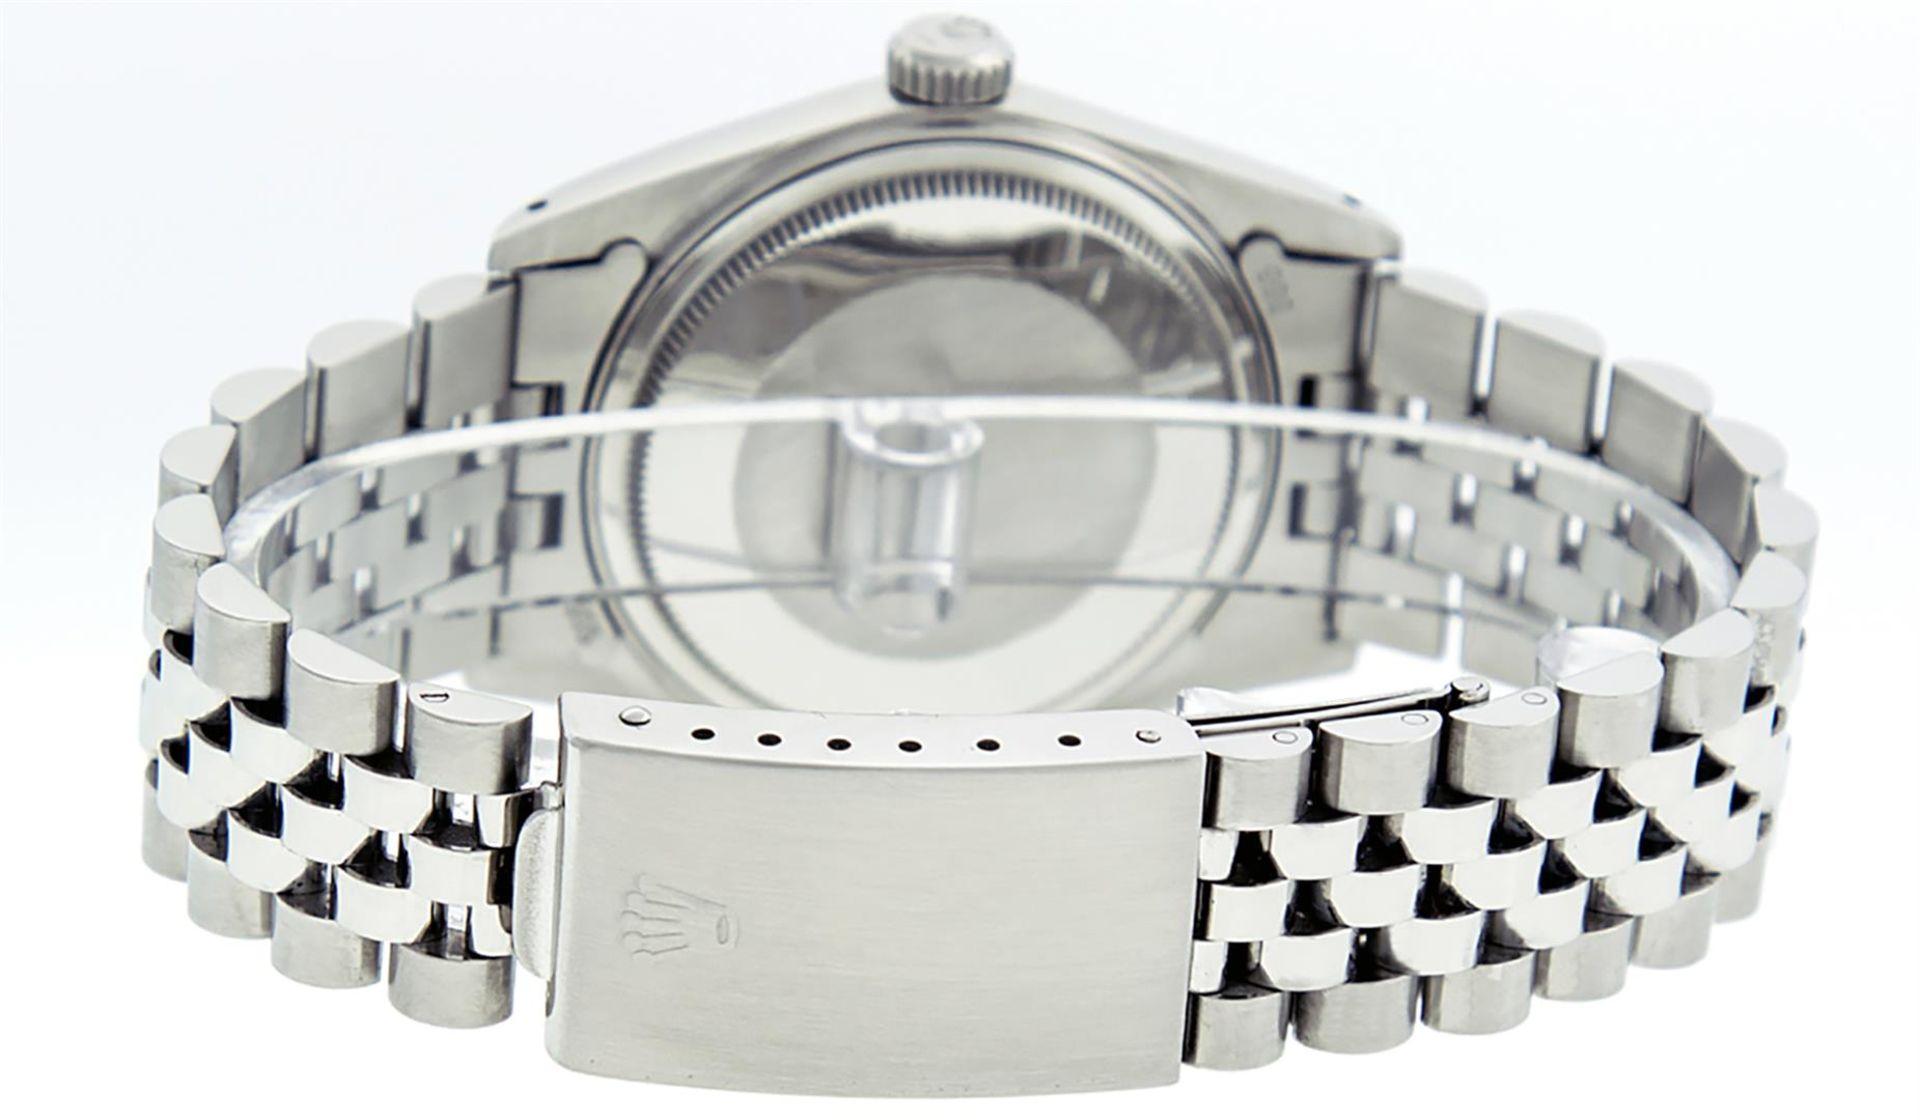 Rolex Mens Stainless Steel Ice Blue Diamond Datejust Wristwatch - Image 7 of 9